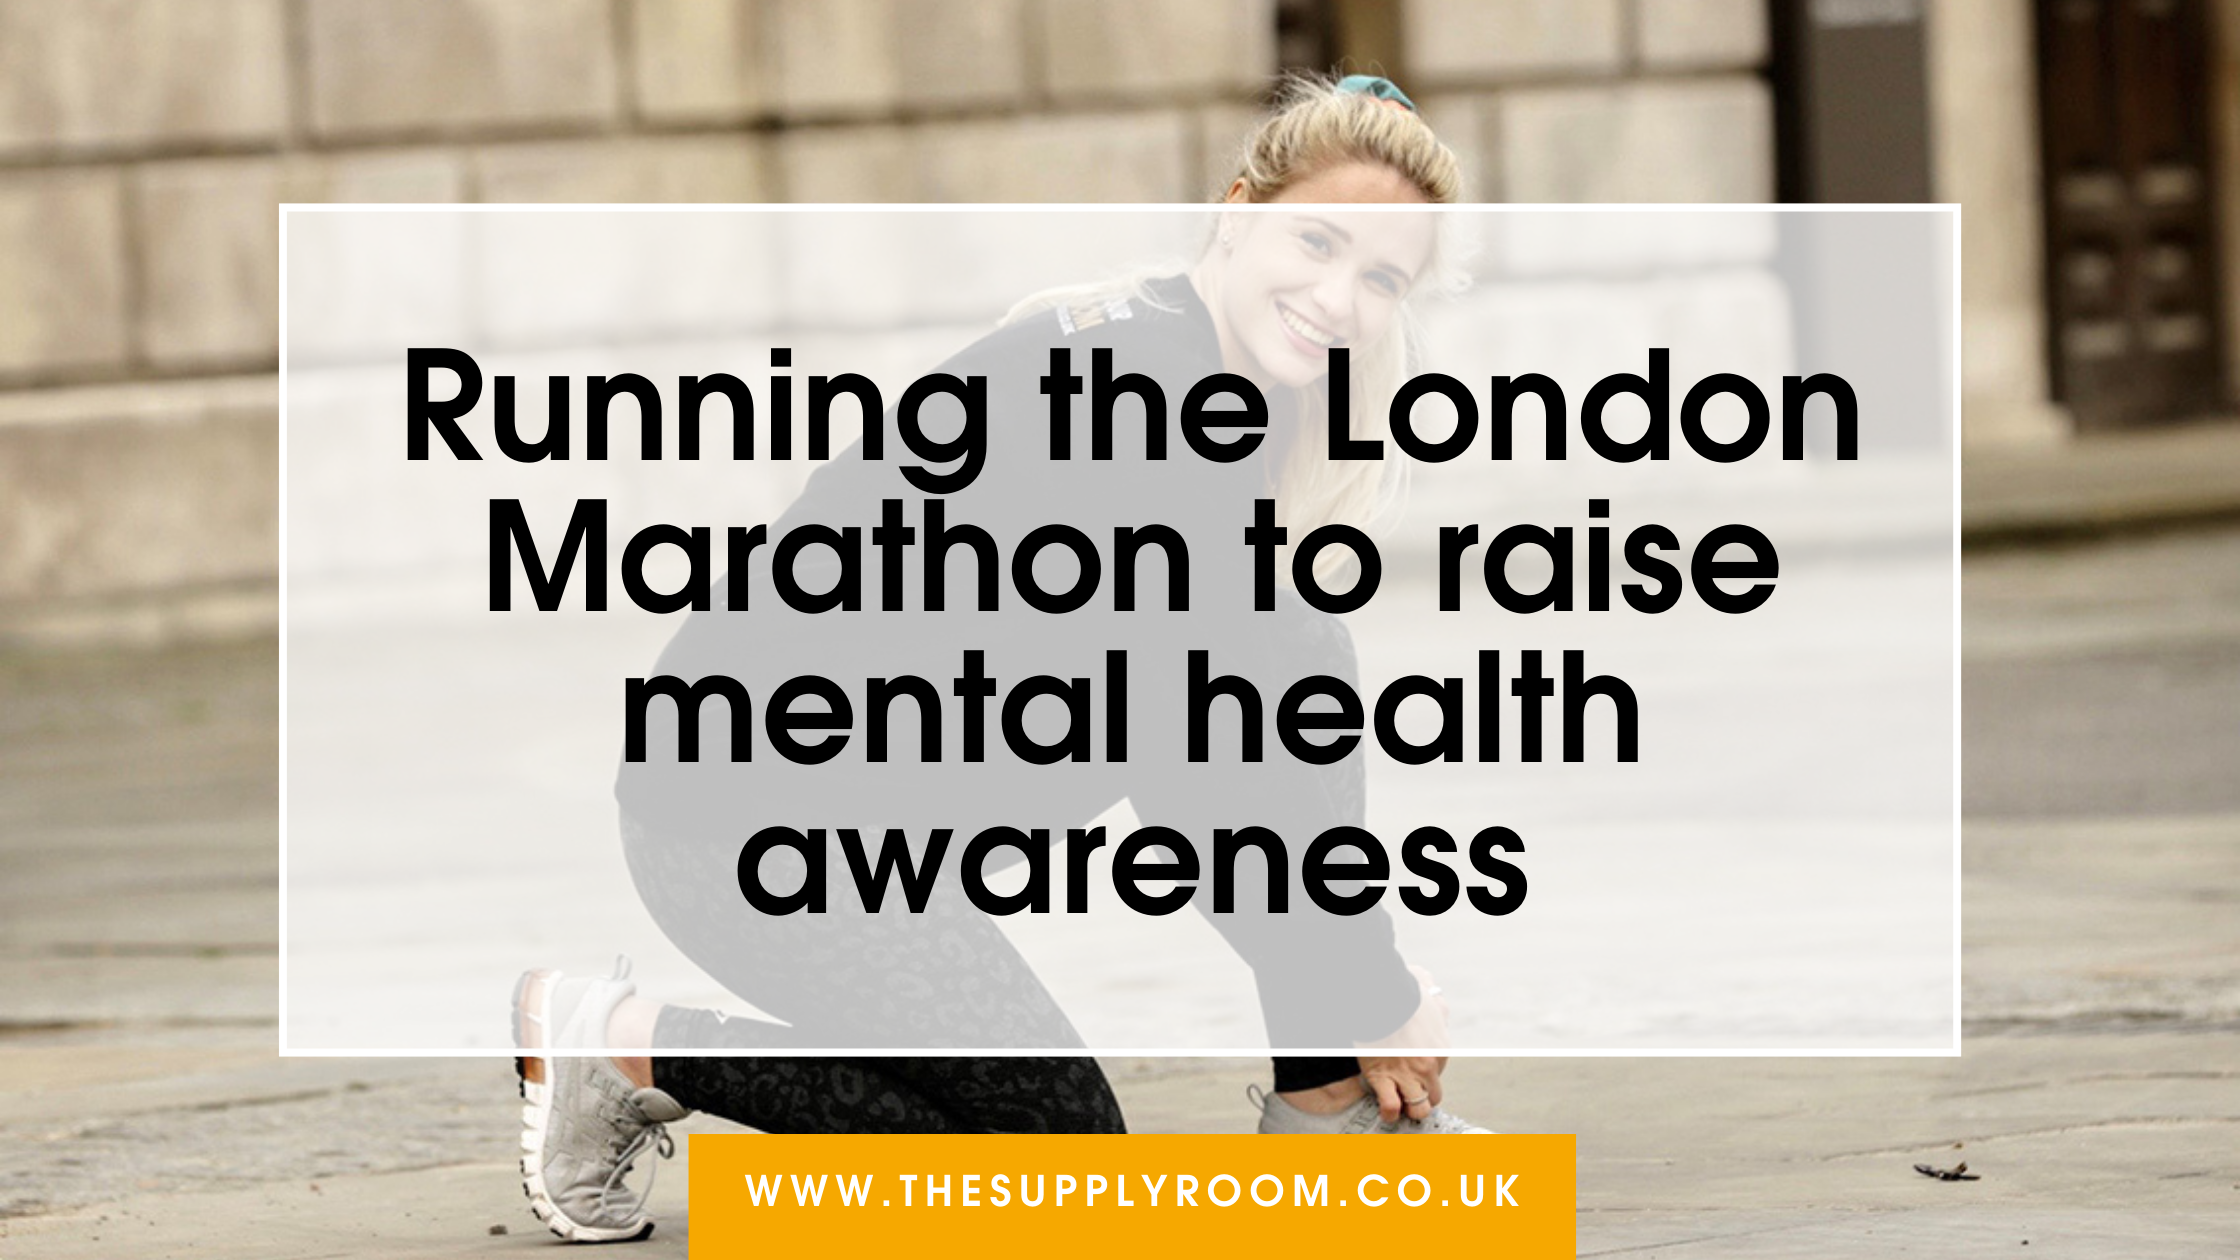 Running the London Marathon to raise mental health awareness